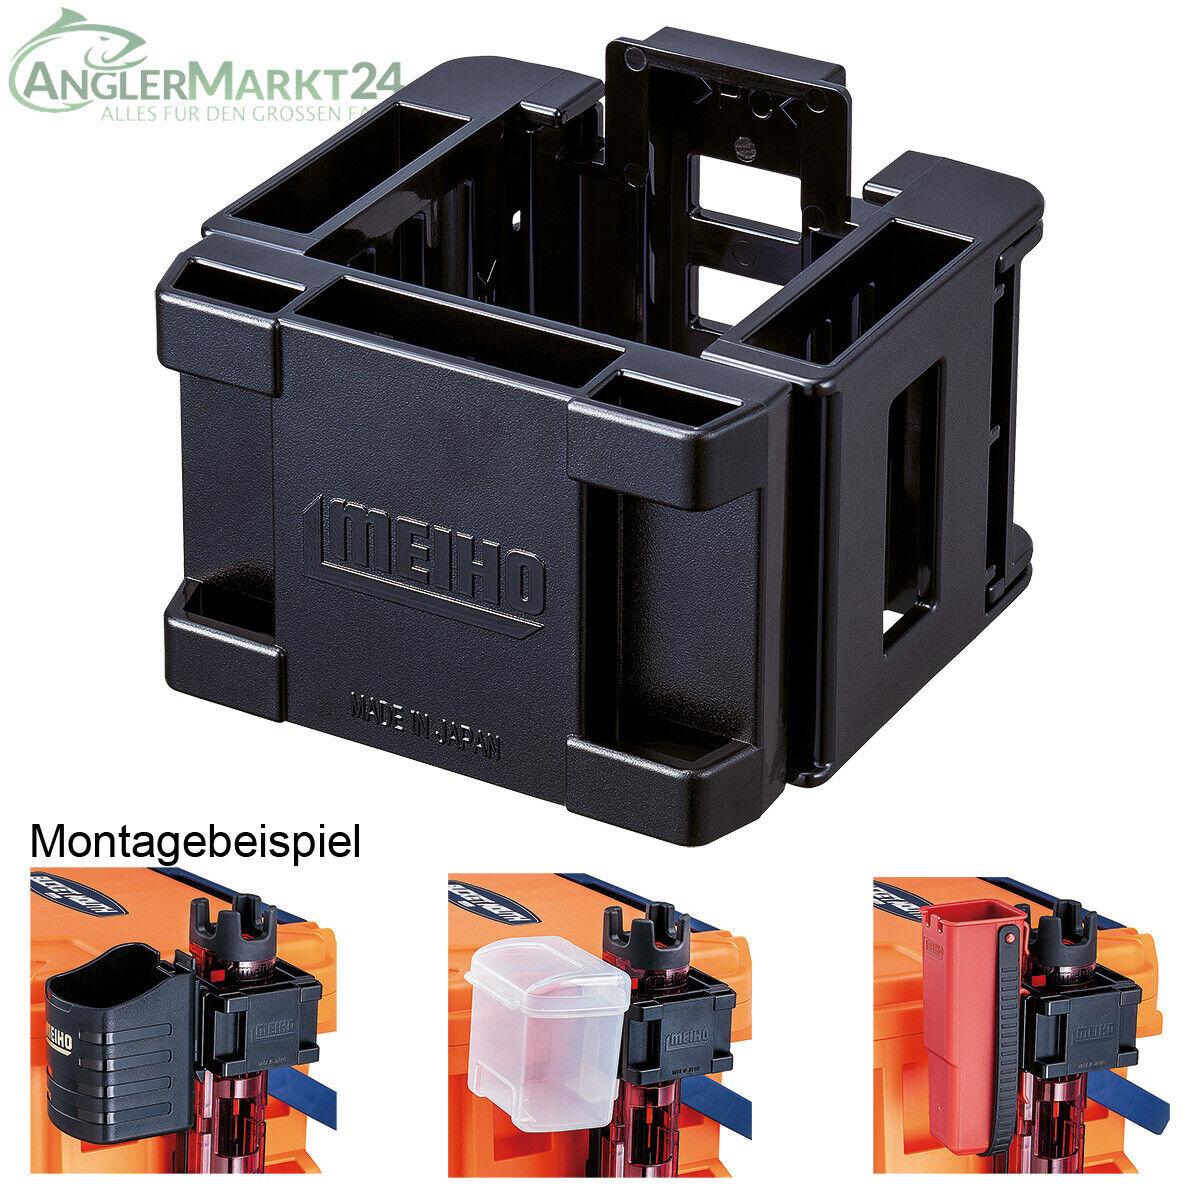 WFT MEIHO BM-7000 Multi Funkction Boxes Bucket Mouth Angelbox OPTIONALES ZUBEHÖR